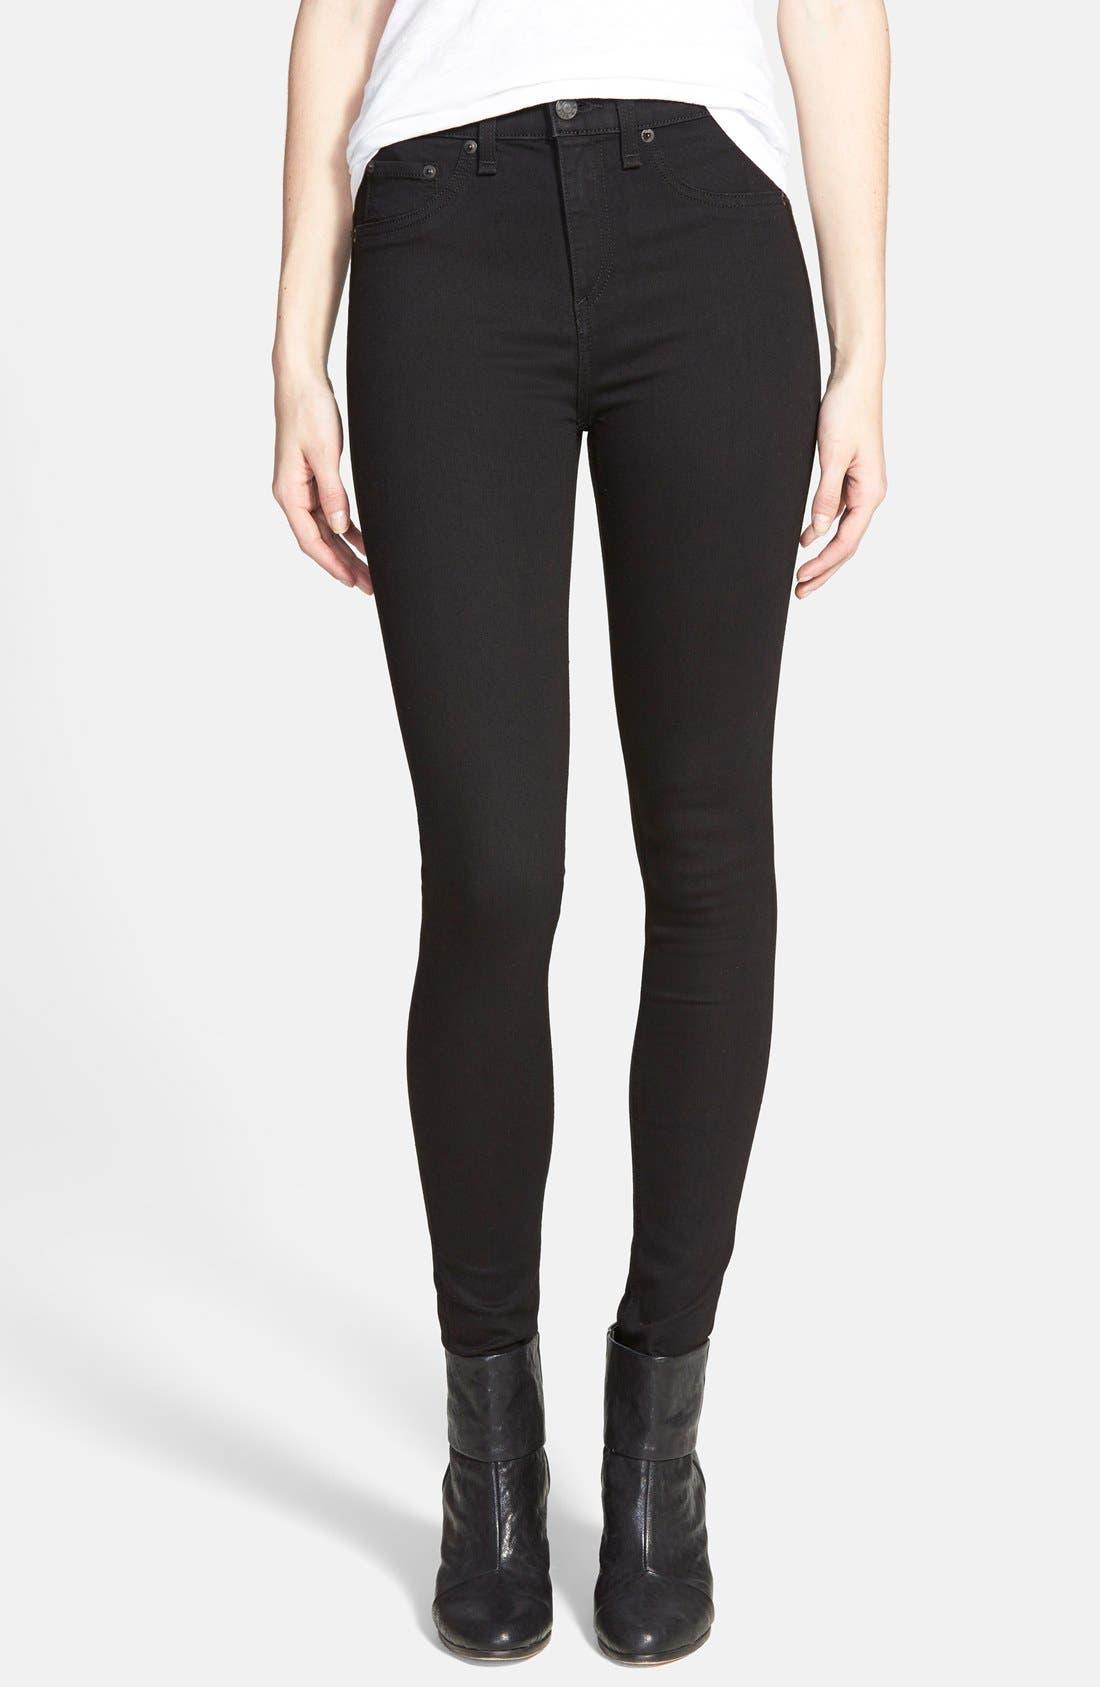 Main Image - rag & bone/JEAN High Waist Leggings (Black)